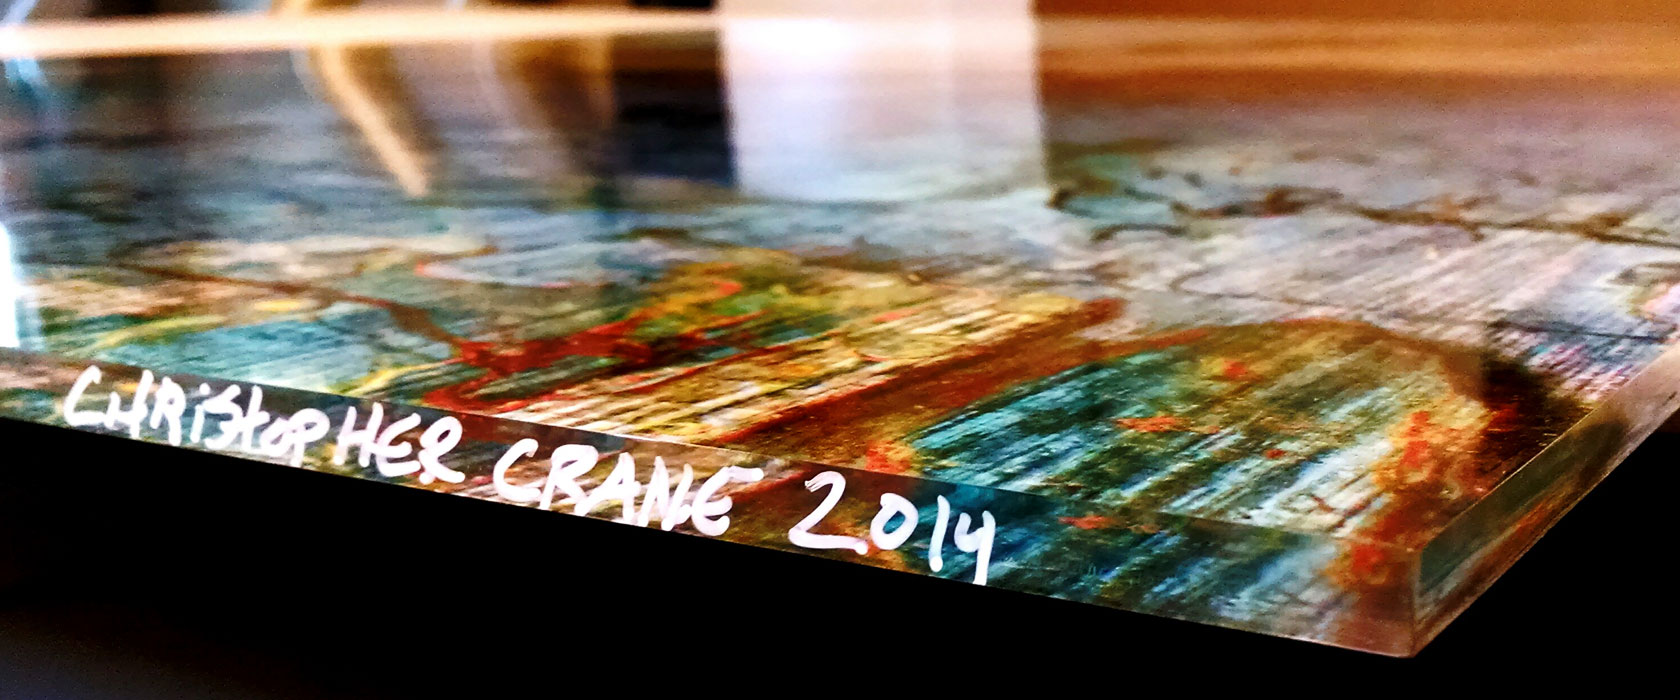 Chris_crane_gallery_abstract_signature_woodbolt_art_corporate_art_abstract_artist_texas